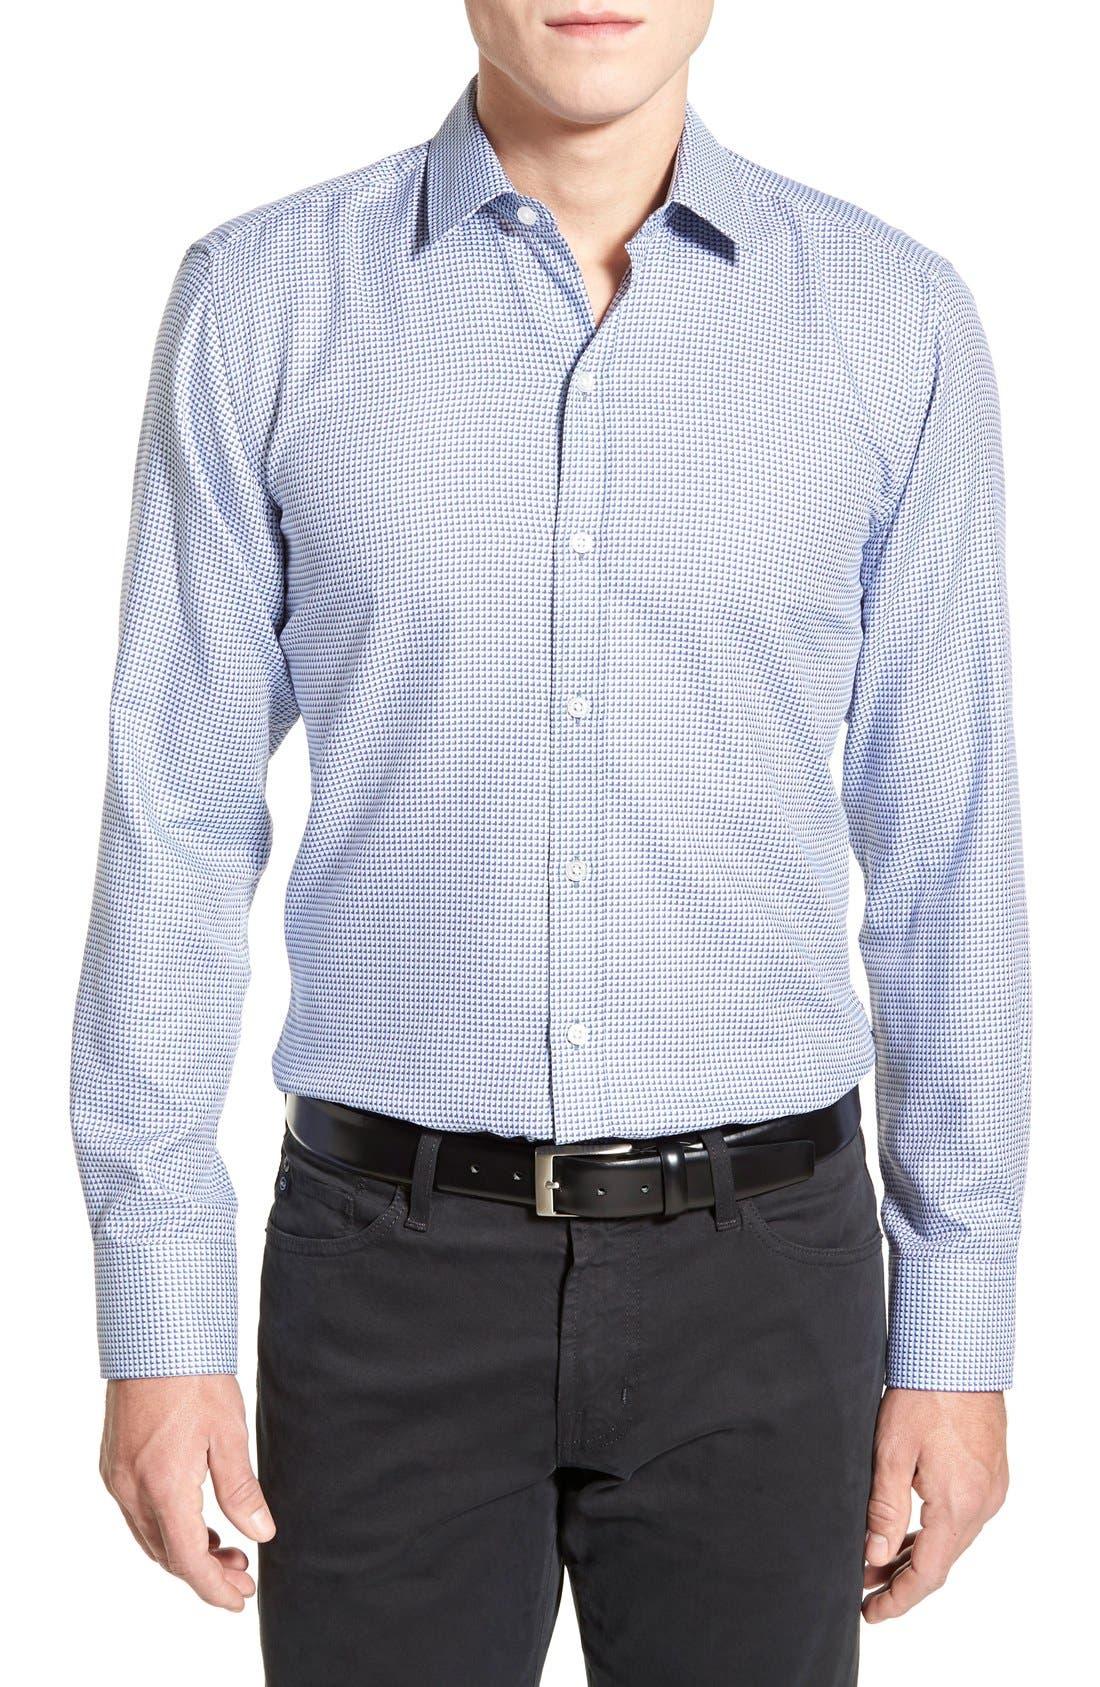 Main Image - BOSS 'Robbie' Slim Fit Sport Shirt